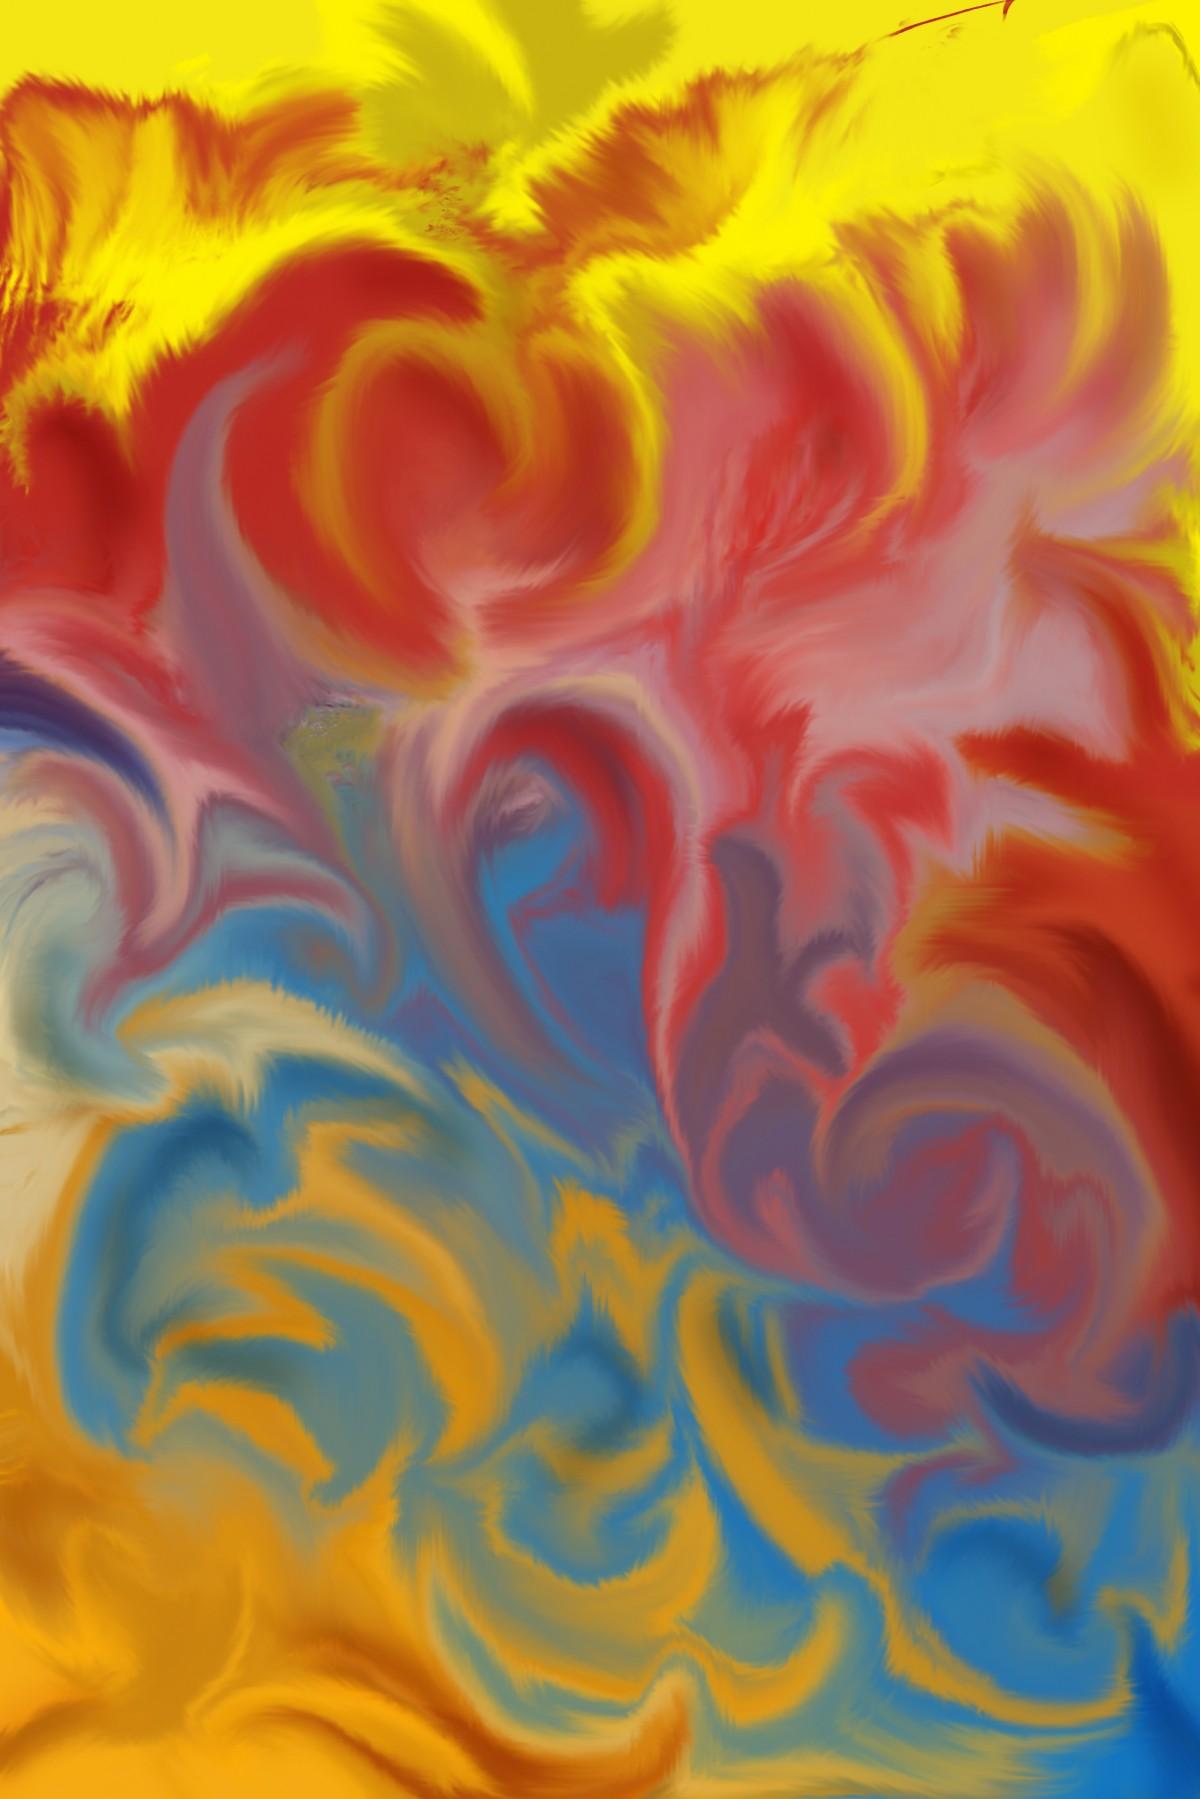 2 Paket Kinder Kunst Kittel Kinder Malerei Schurzen Wasserdicht Kunstler Kittel Fur Kinder Langarm Malerei Schurze Kinder Schurze Kinder Malereikinder Wasserdicht Aliexpress